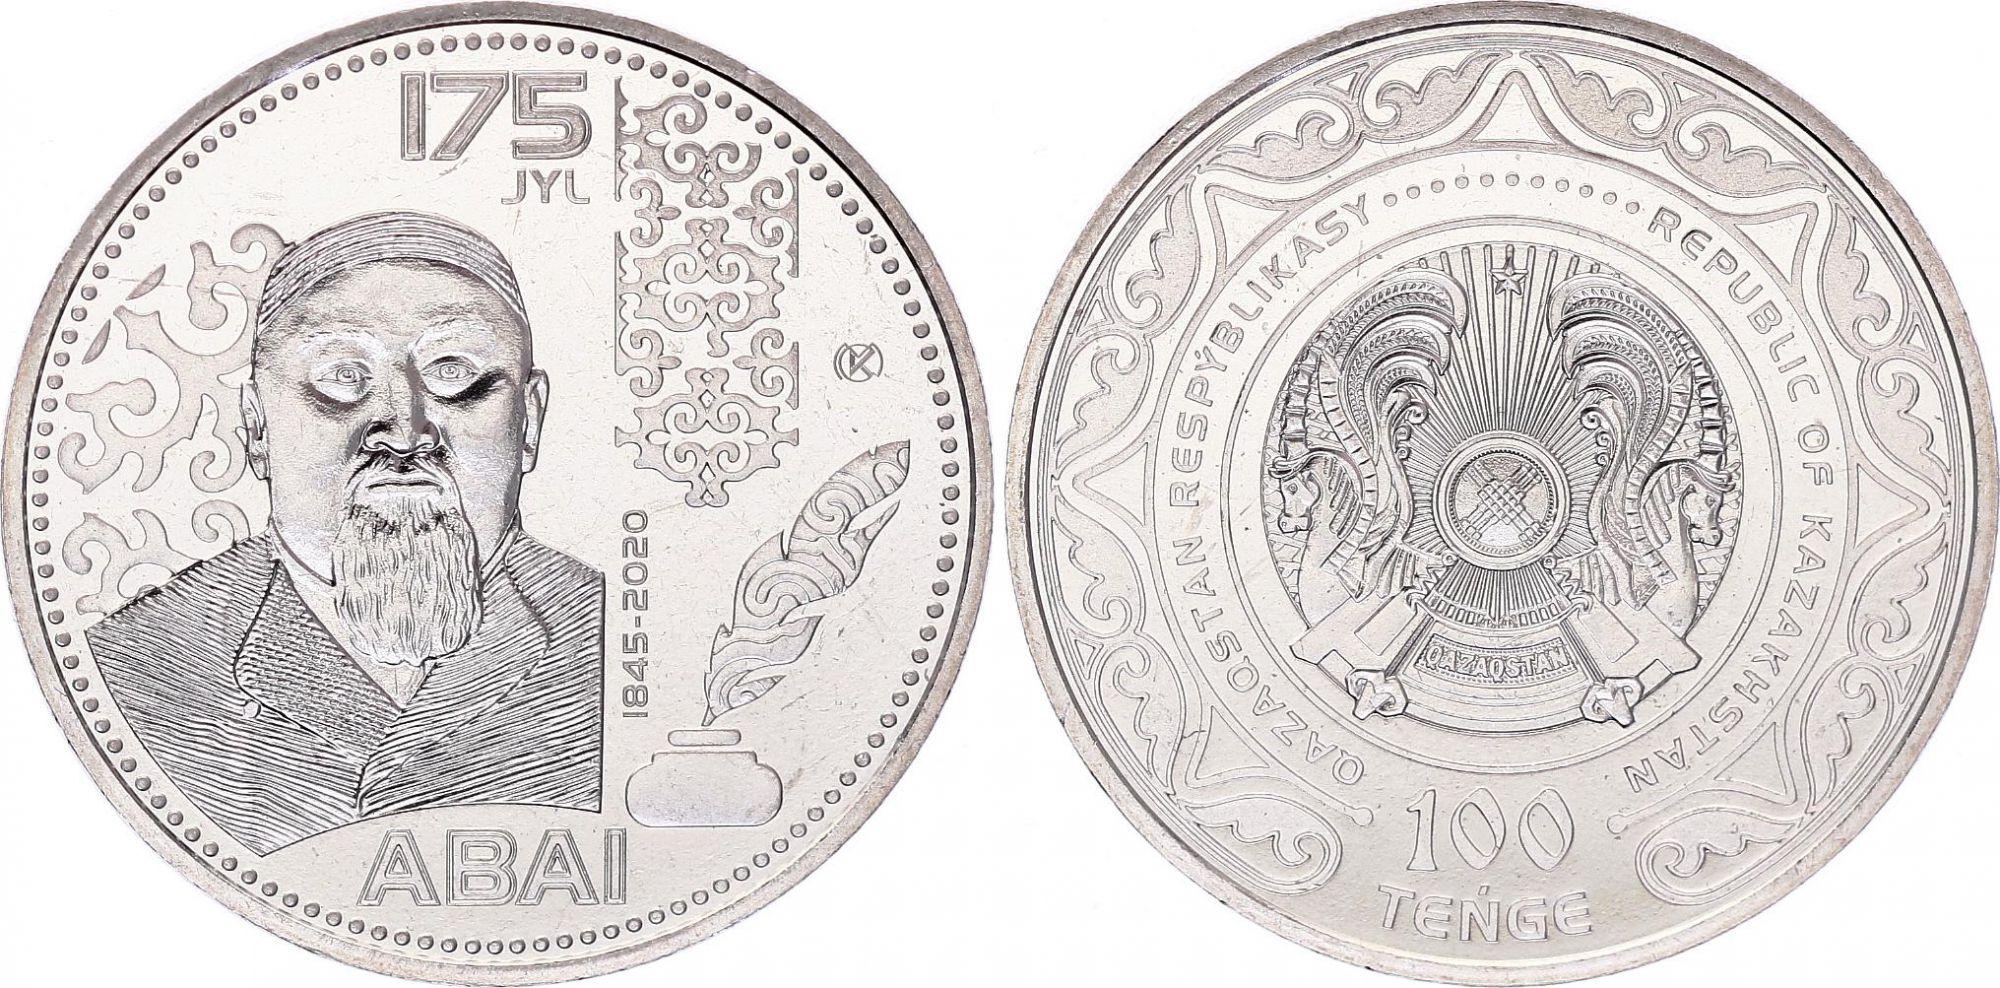 Kazakhstan 100 Tenge Abai Kunanbayev - 2020 - SPL